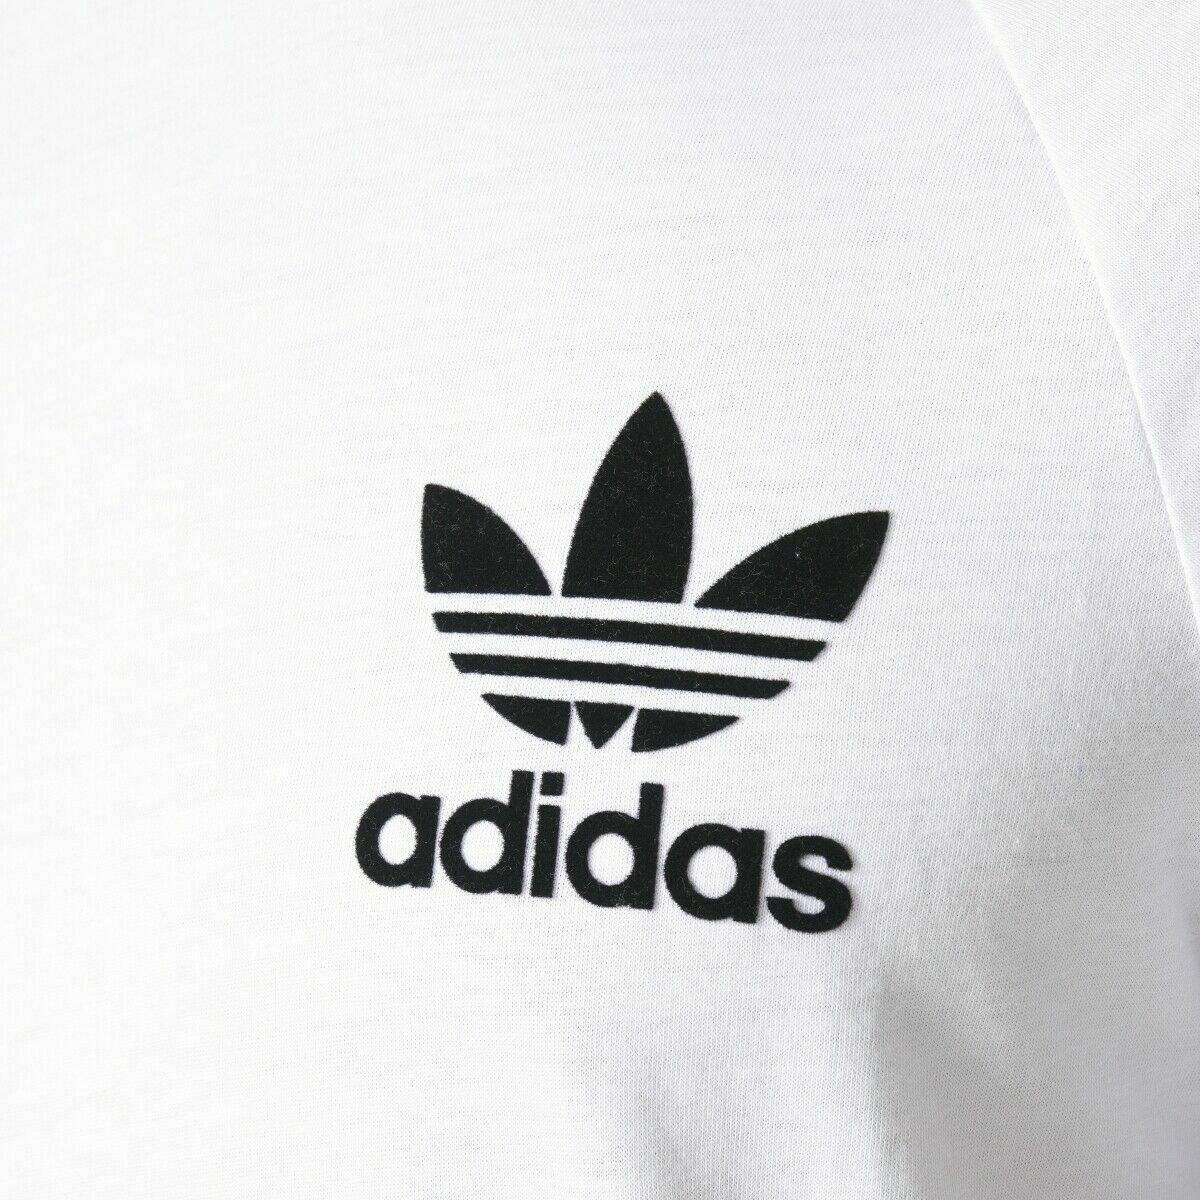 thumbnail 17 - Adidas Originals California Men's T-Shirt Trefoil Retro 3-Stripes Short Sleeve